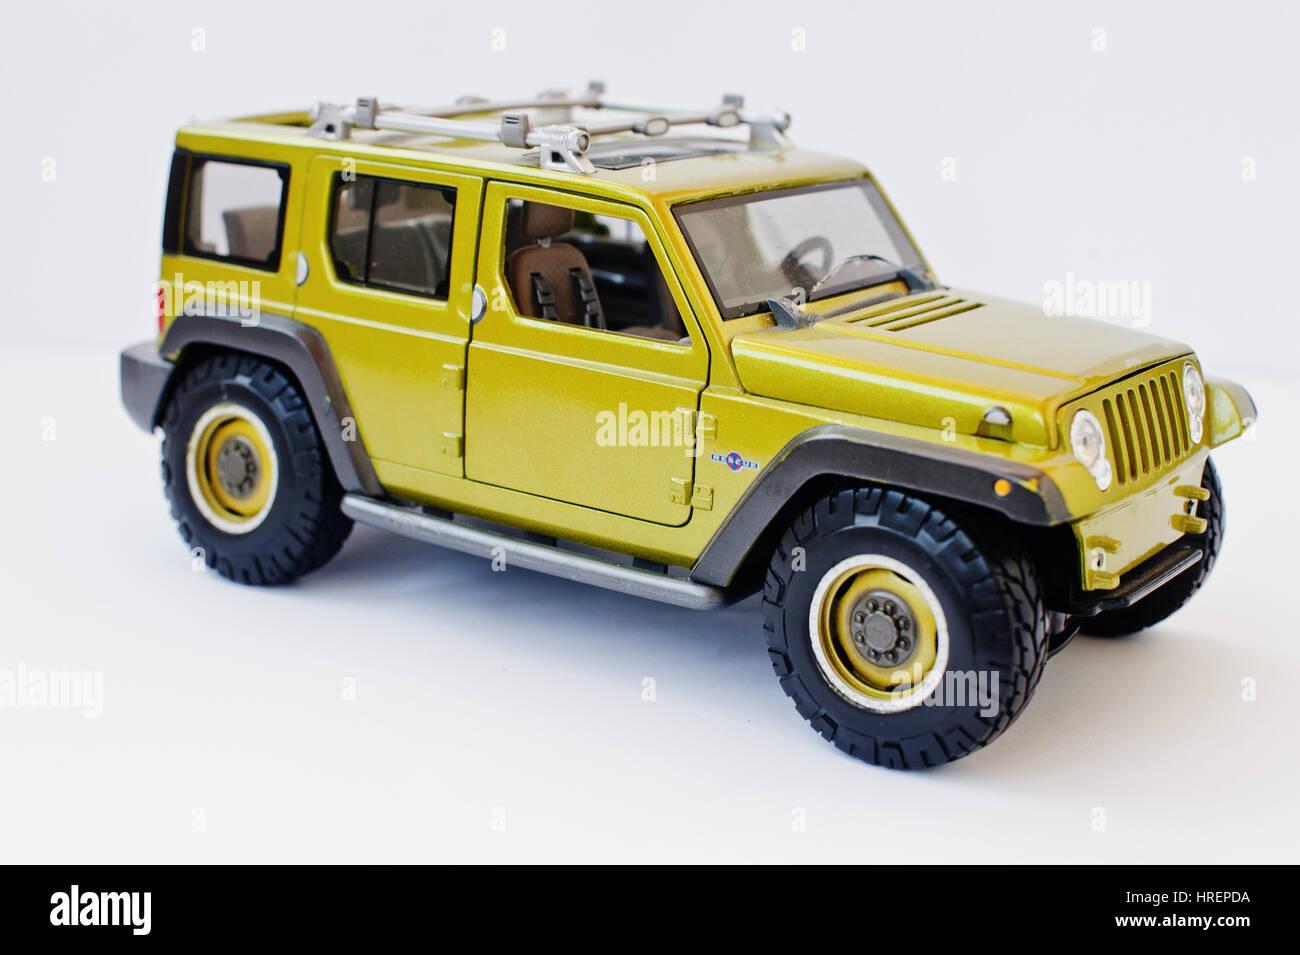 Hai Ukraine March 1 2017 Mini Copy Of Green Toy Car Jeep Stock